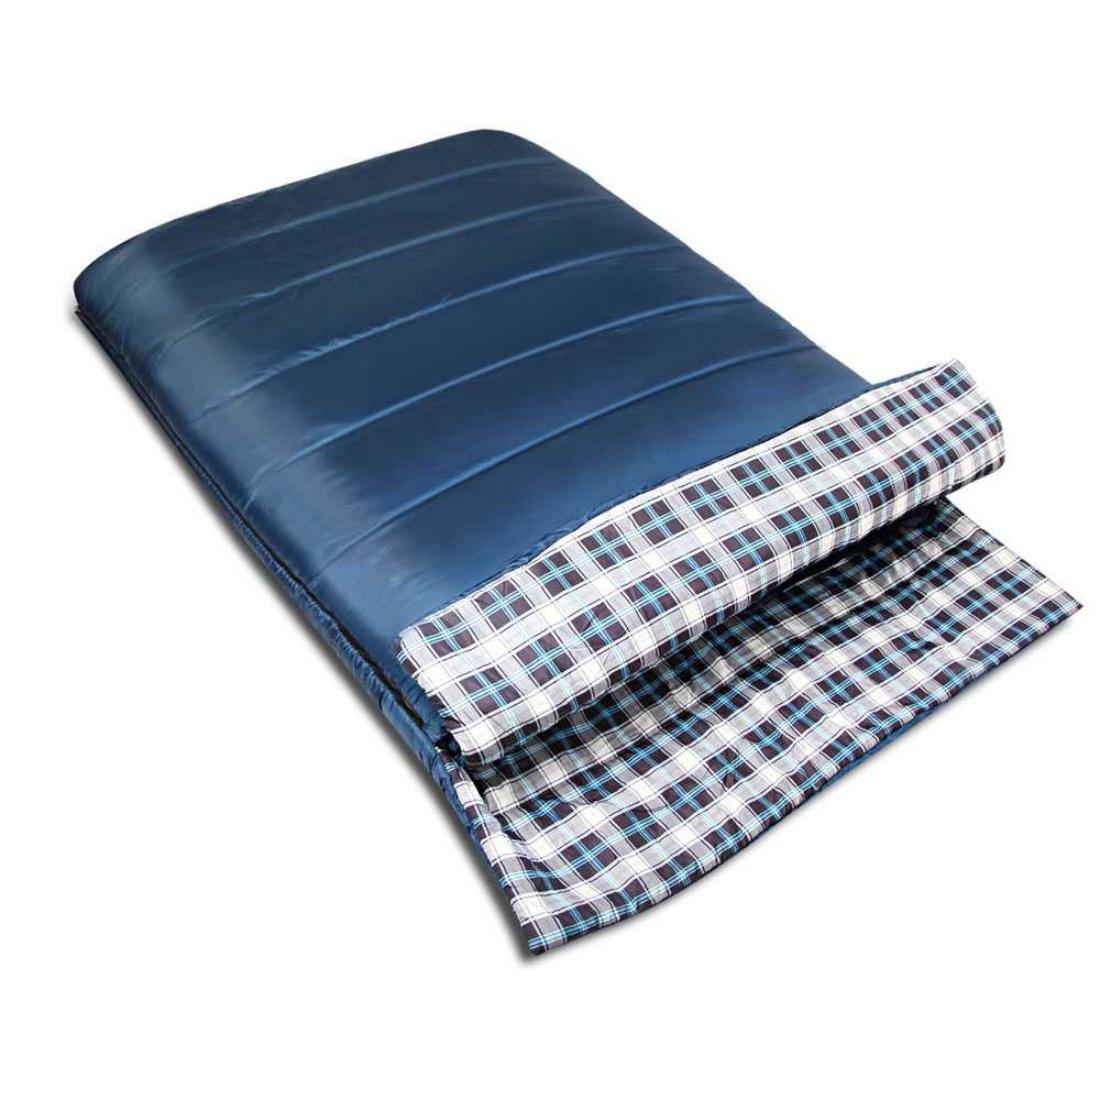 Camping Envelope Sleeping Bag Double Navy